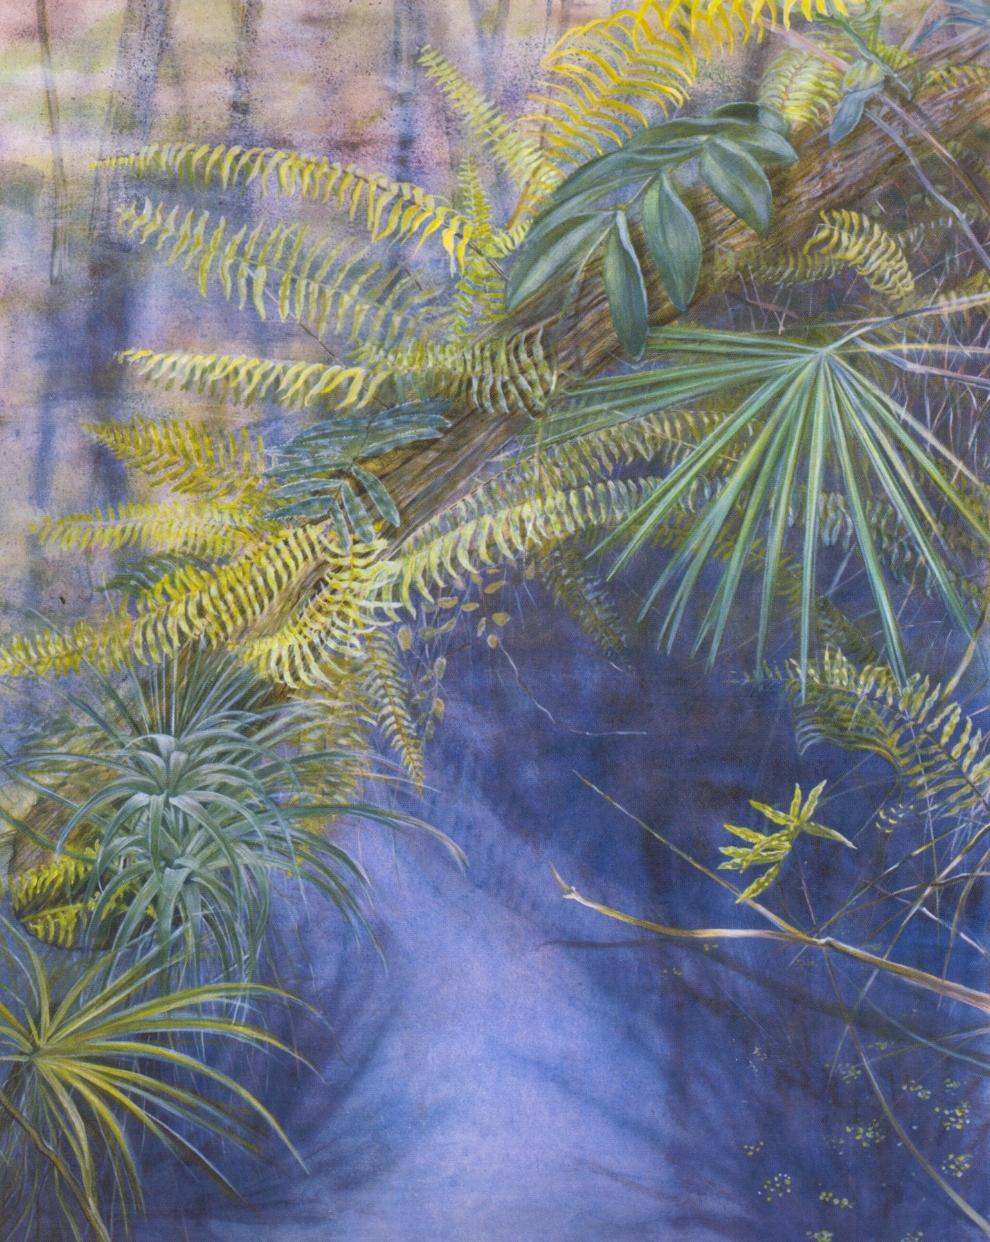 Diagonal Log   Oil on canvas, 60'' x 48'', 2003